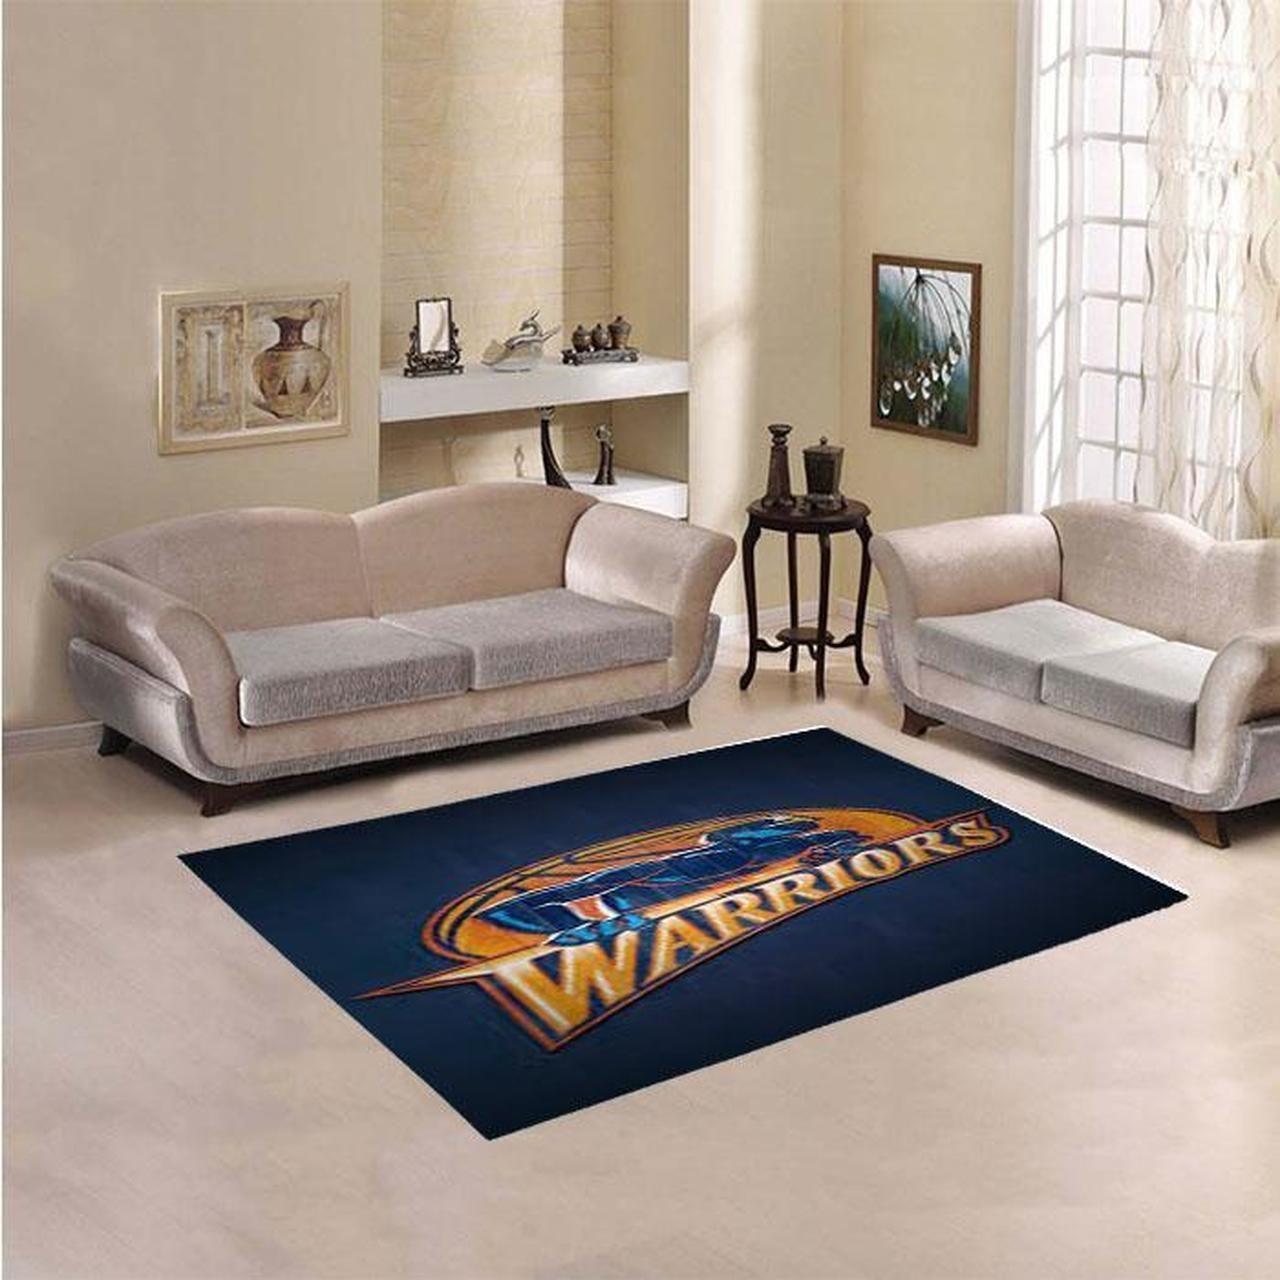 Amazon Golden State Warriors Living Room Area No3086 Rug